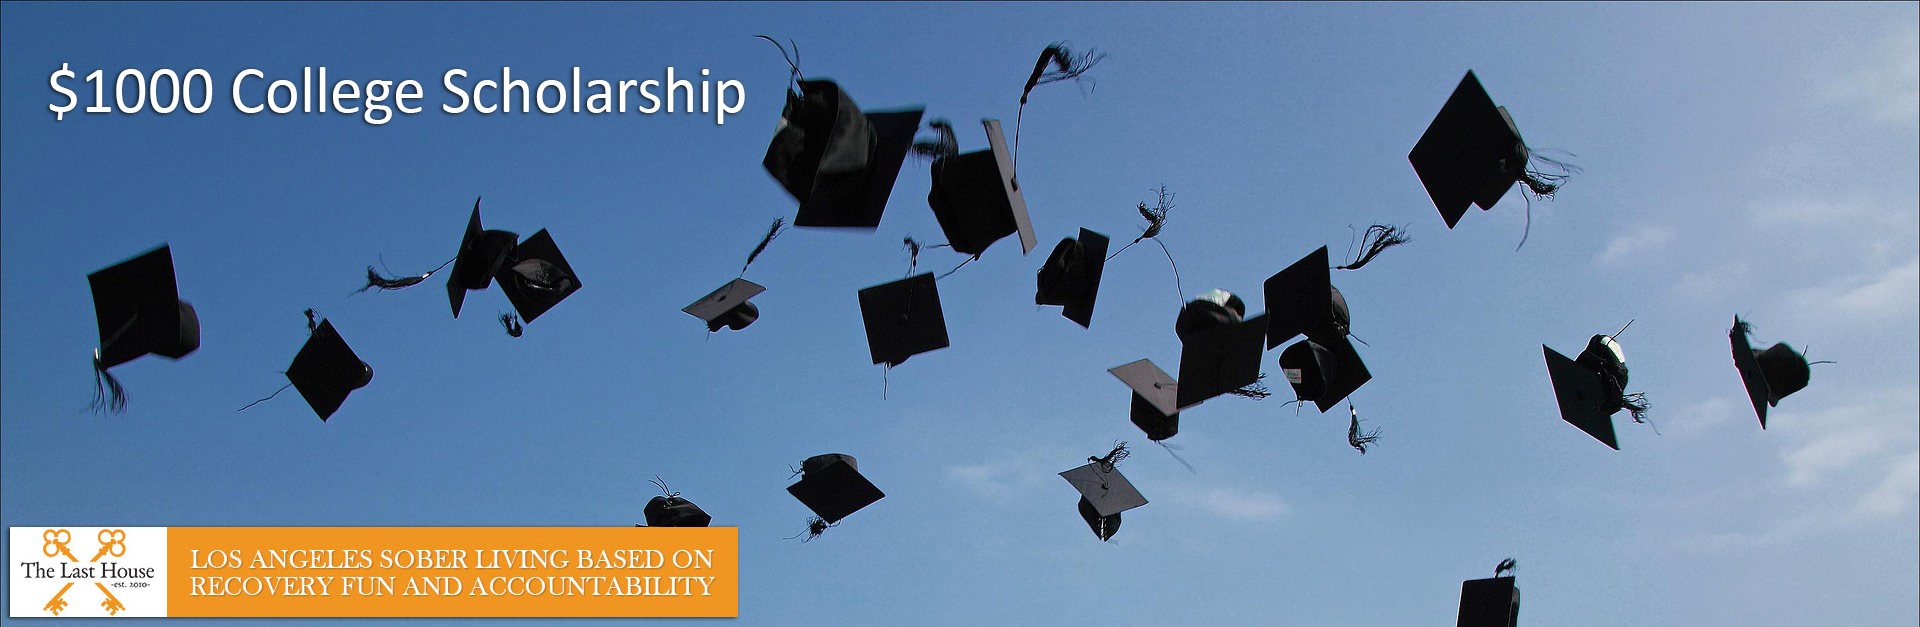 last house college scholarship